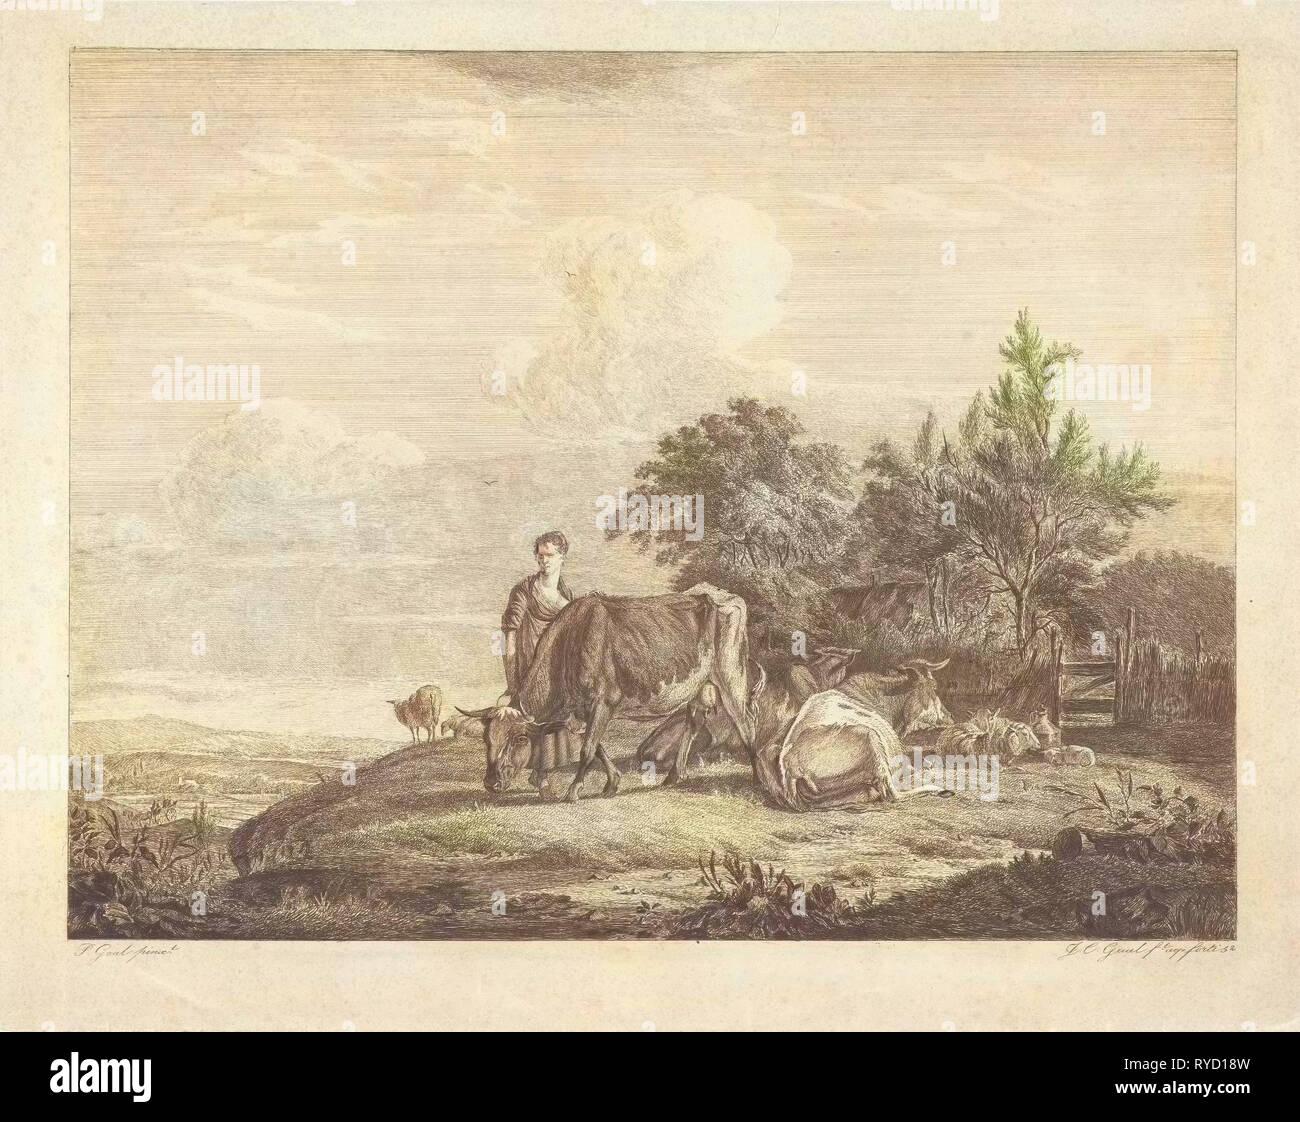 Landscape with shepherdess with her flock, print maker: Jacobus Cornelis Gaal, Pieter Gaal, 1852 - Stock Image